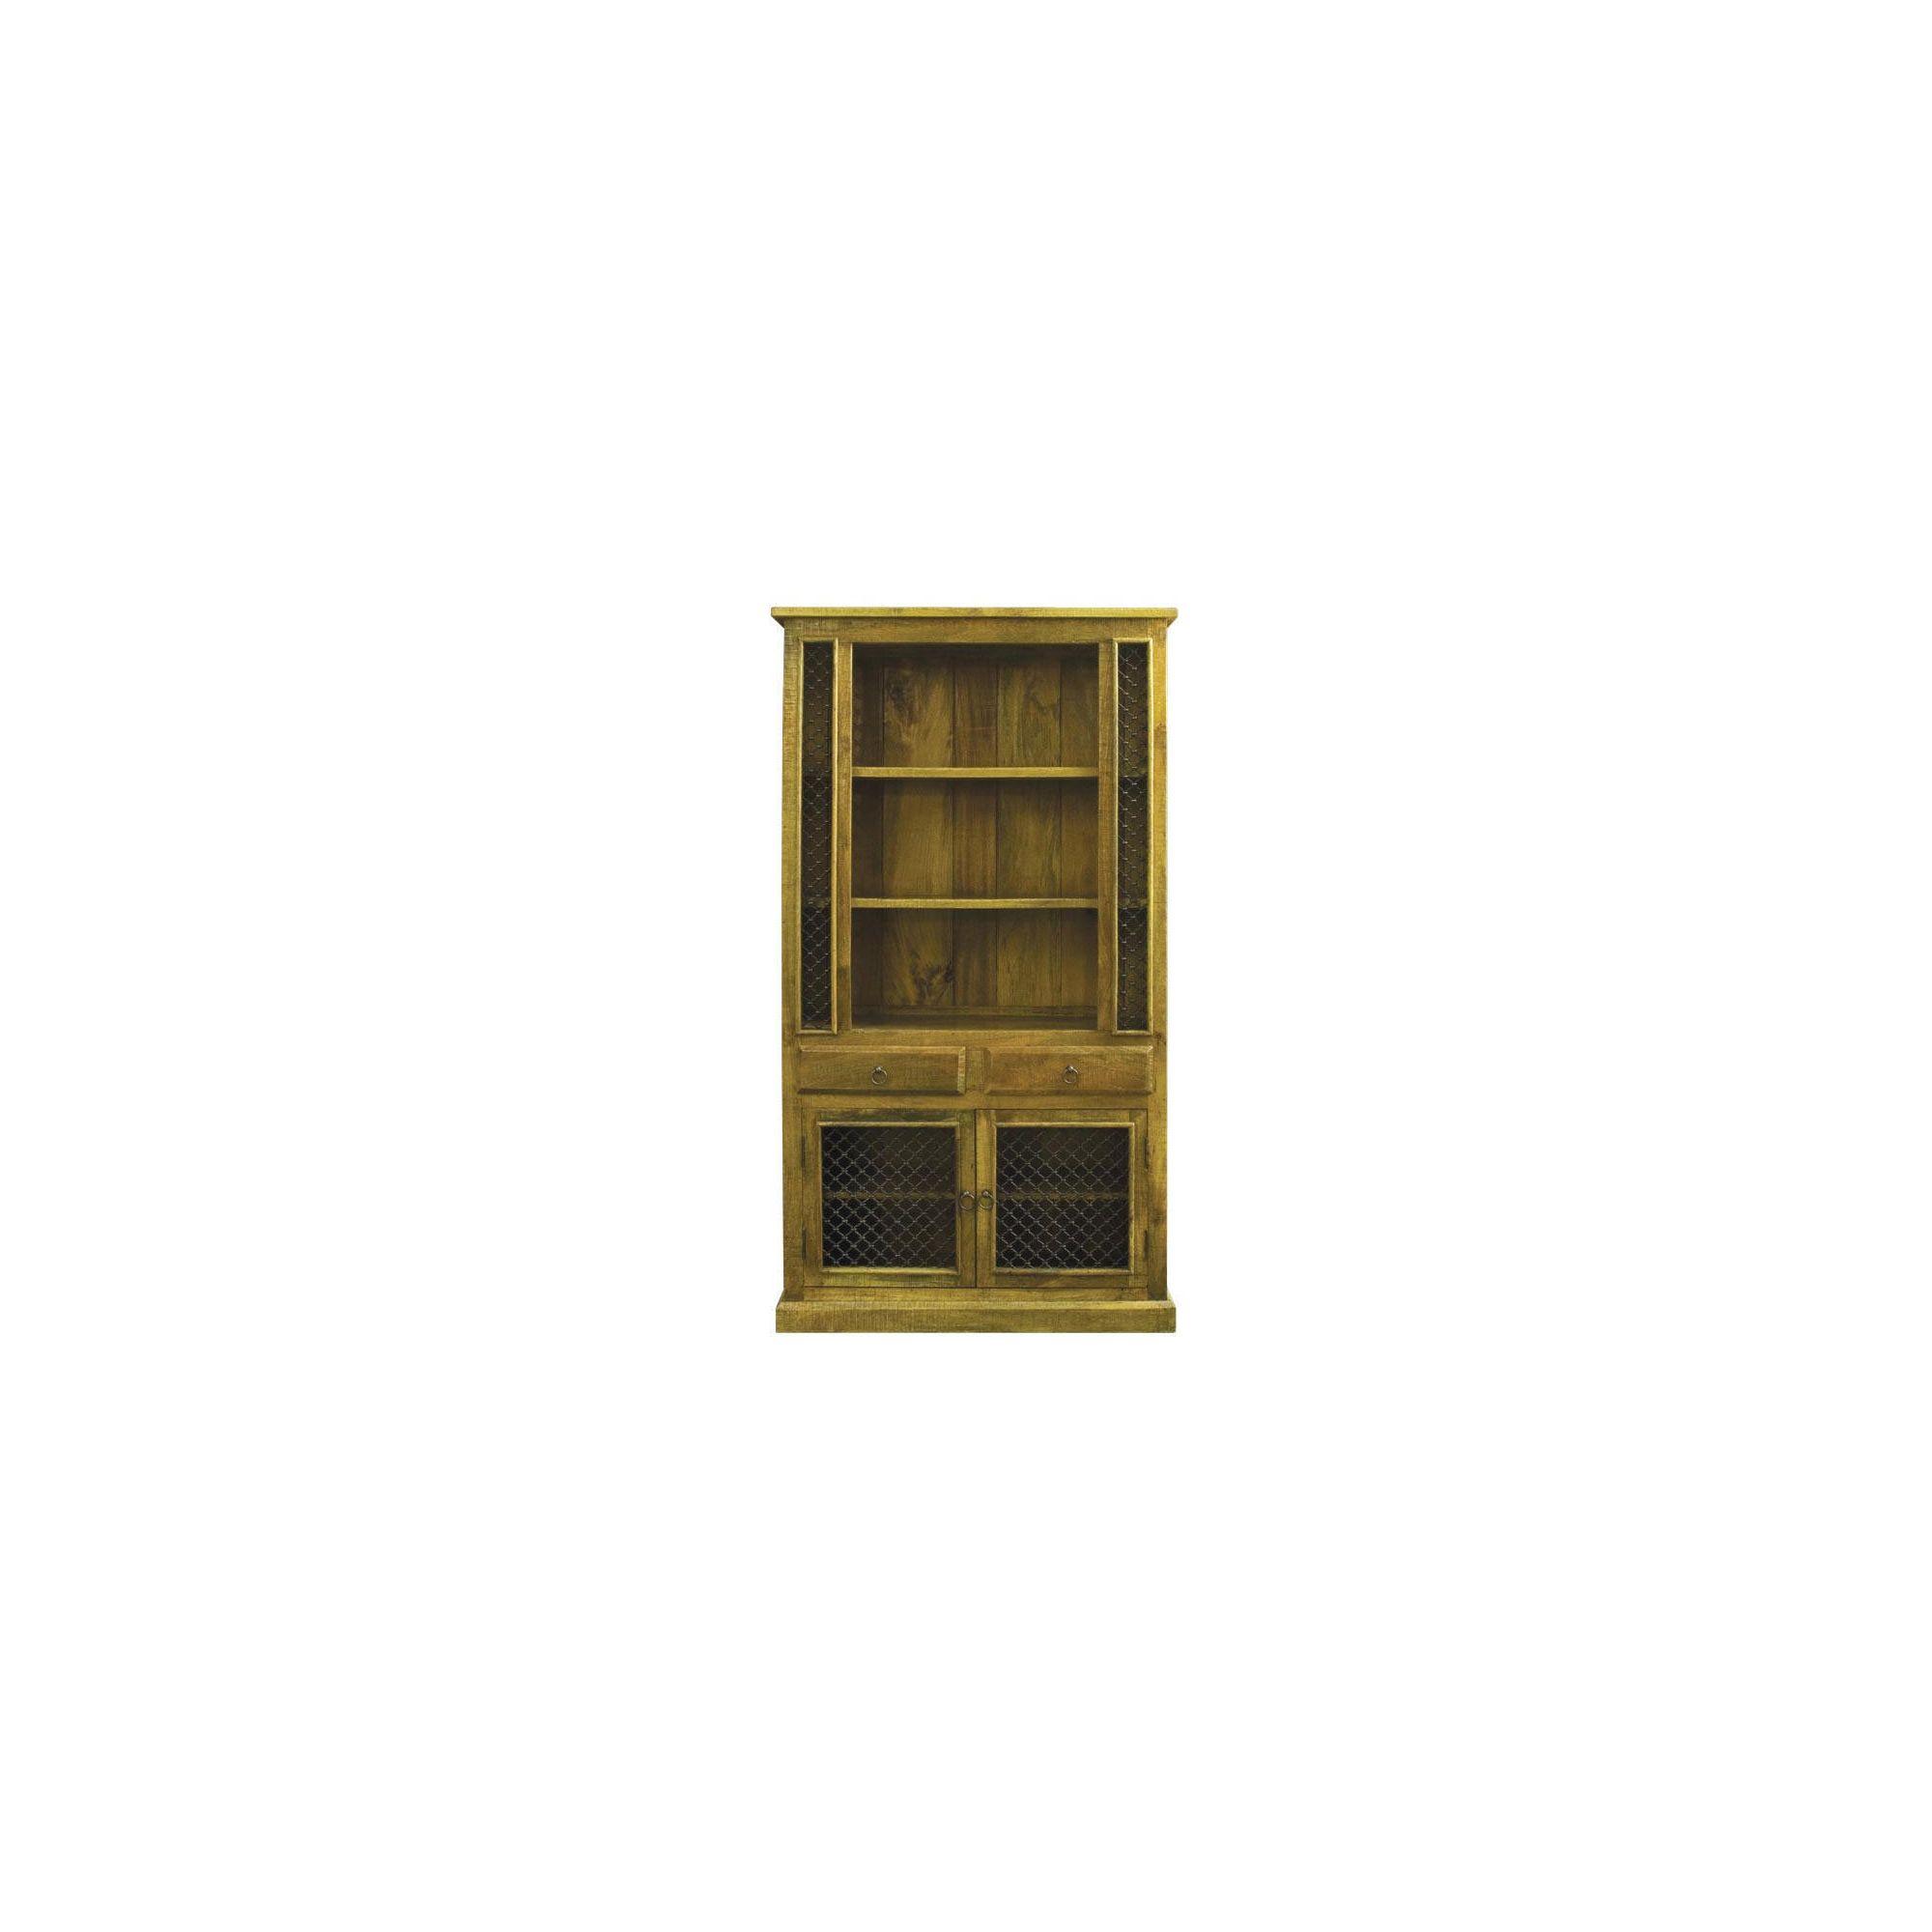 Alterton Furniture Rutland Jali Tall Bookcase at Tesco Direct